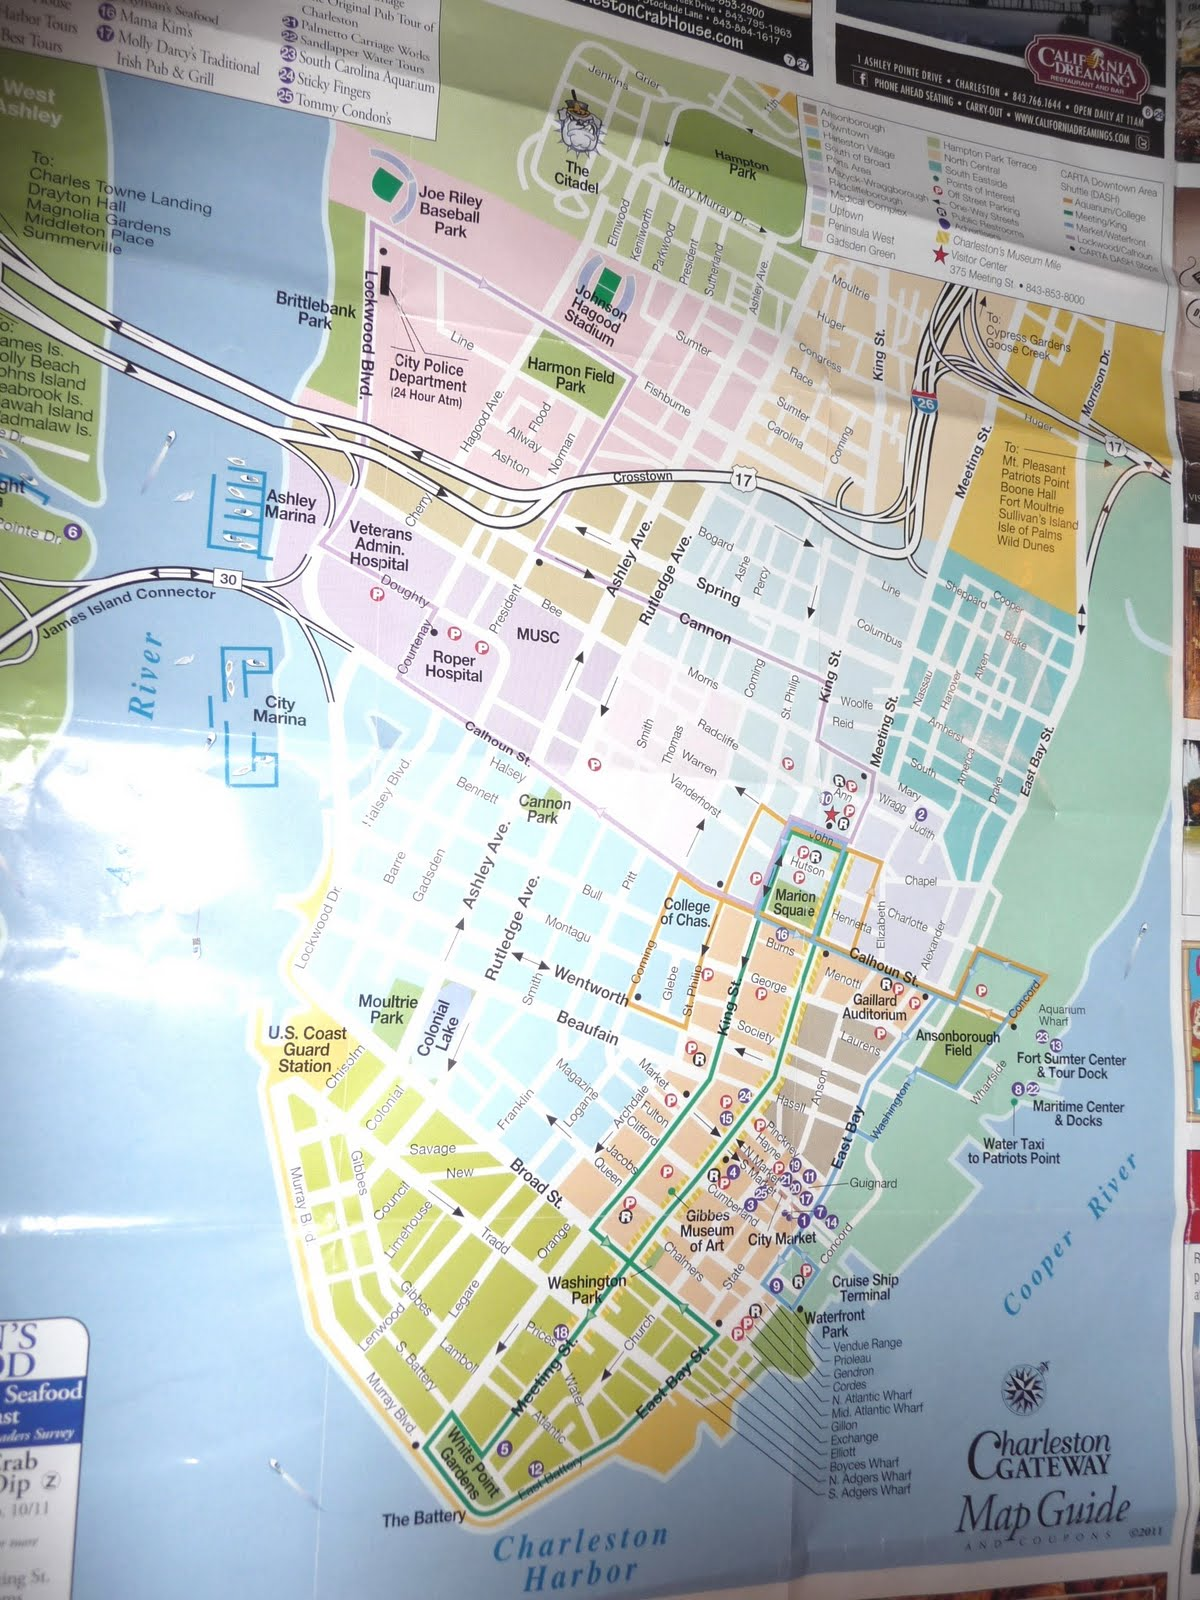 seniors walking across america POST 476 DAY 270 13 – Charleston Tourist Map